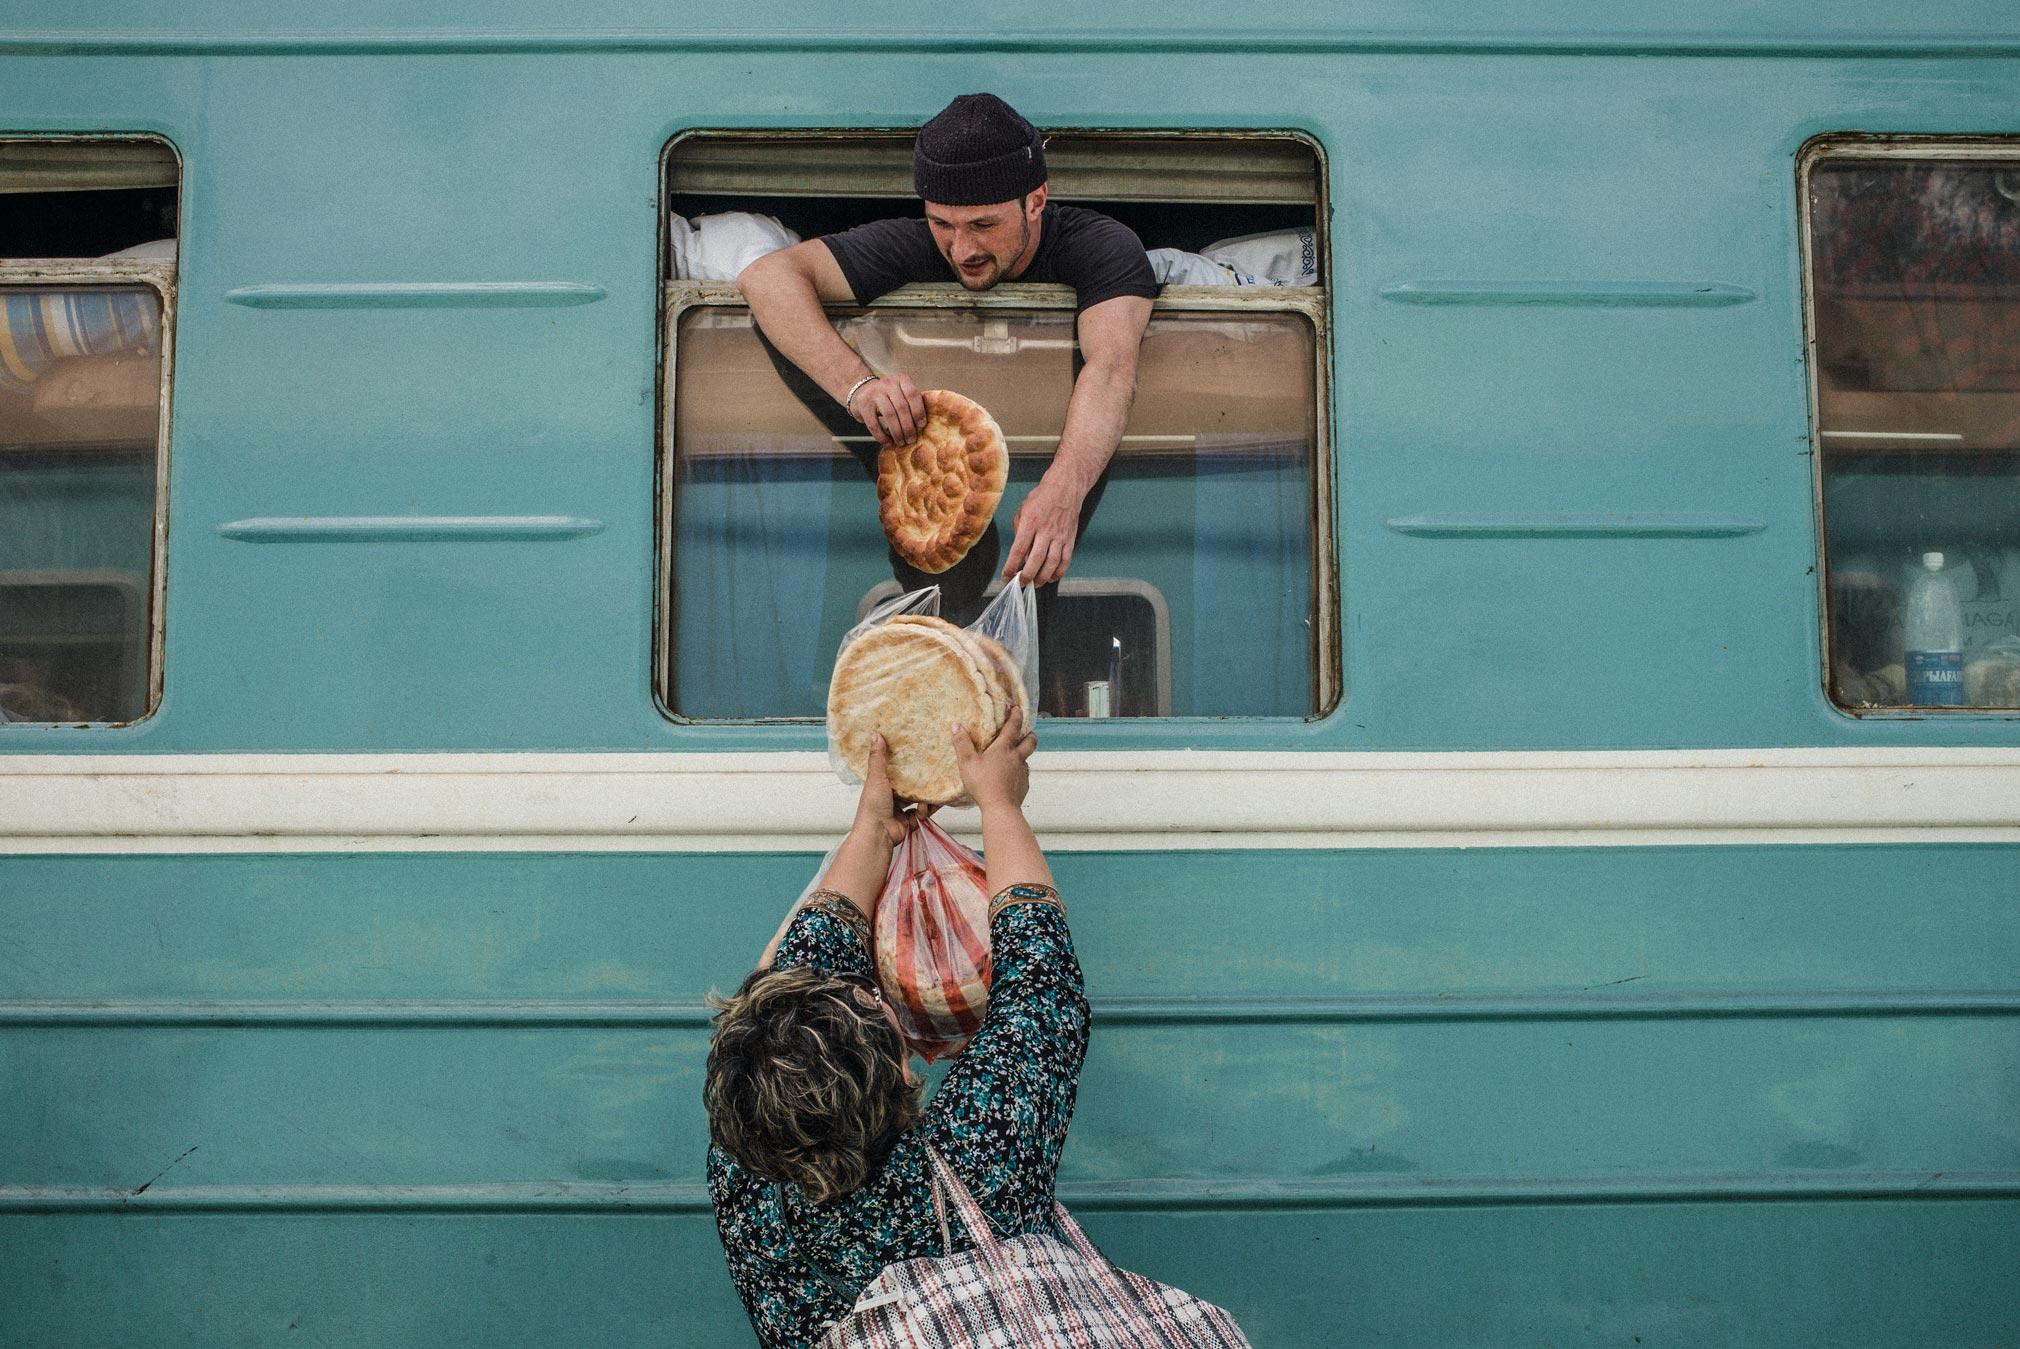 Daniel_Zvereff-Turkistan-Kazakhstan-1009078